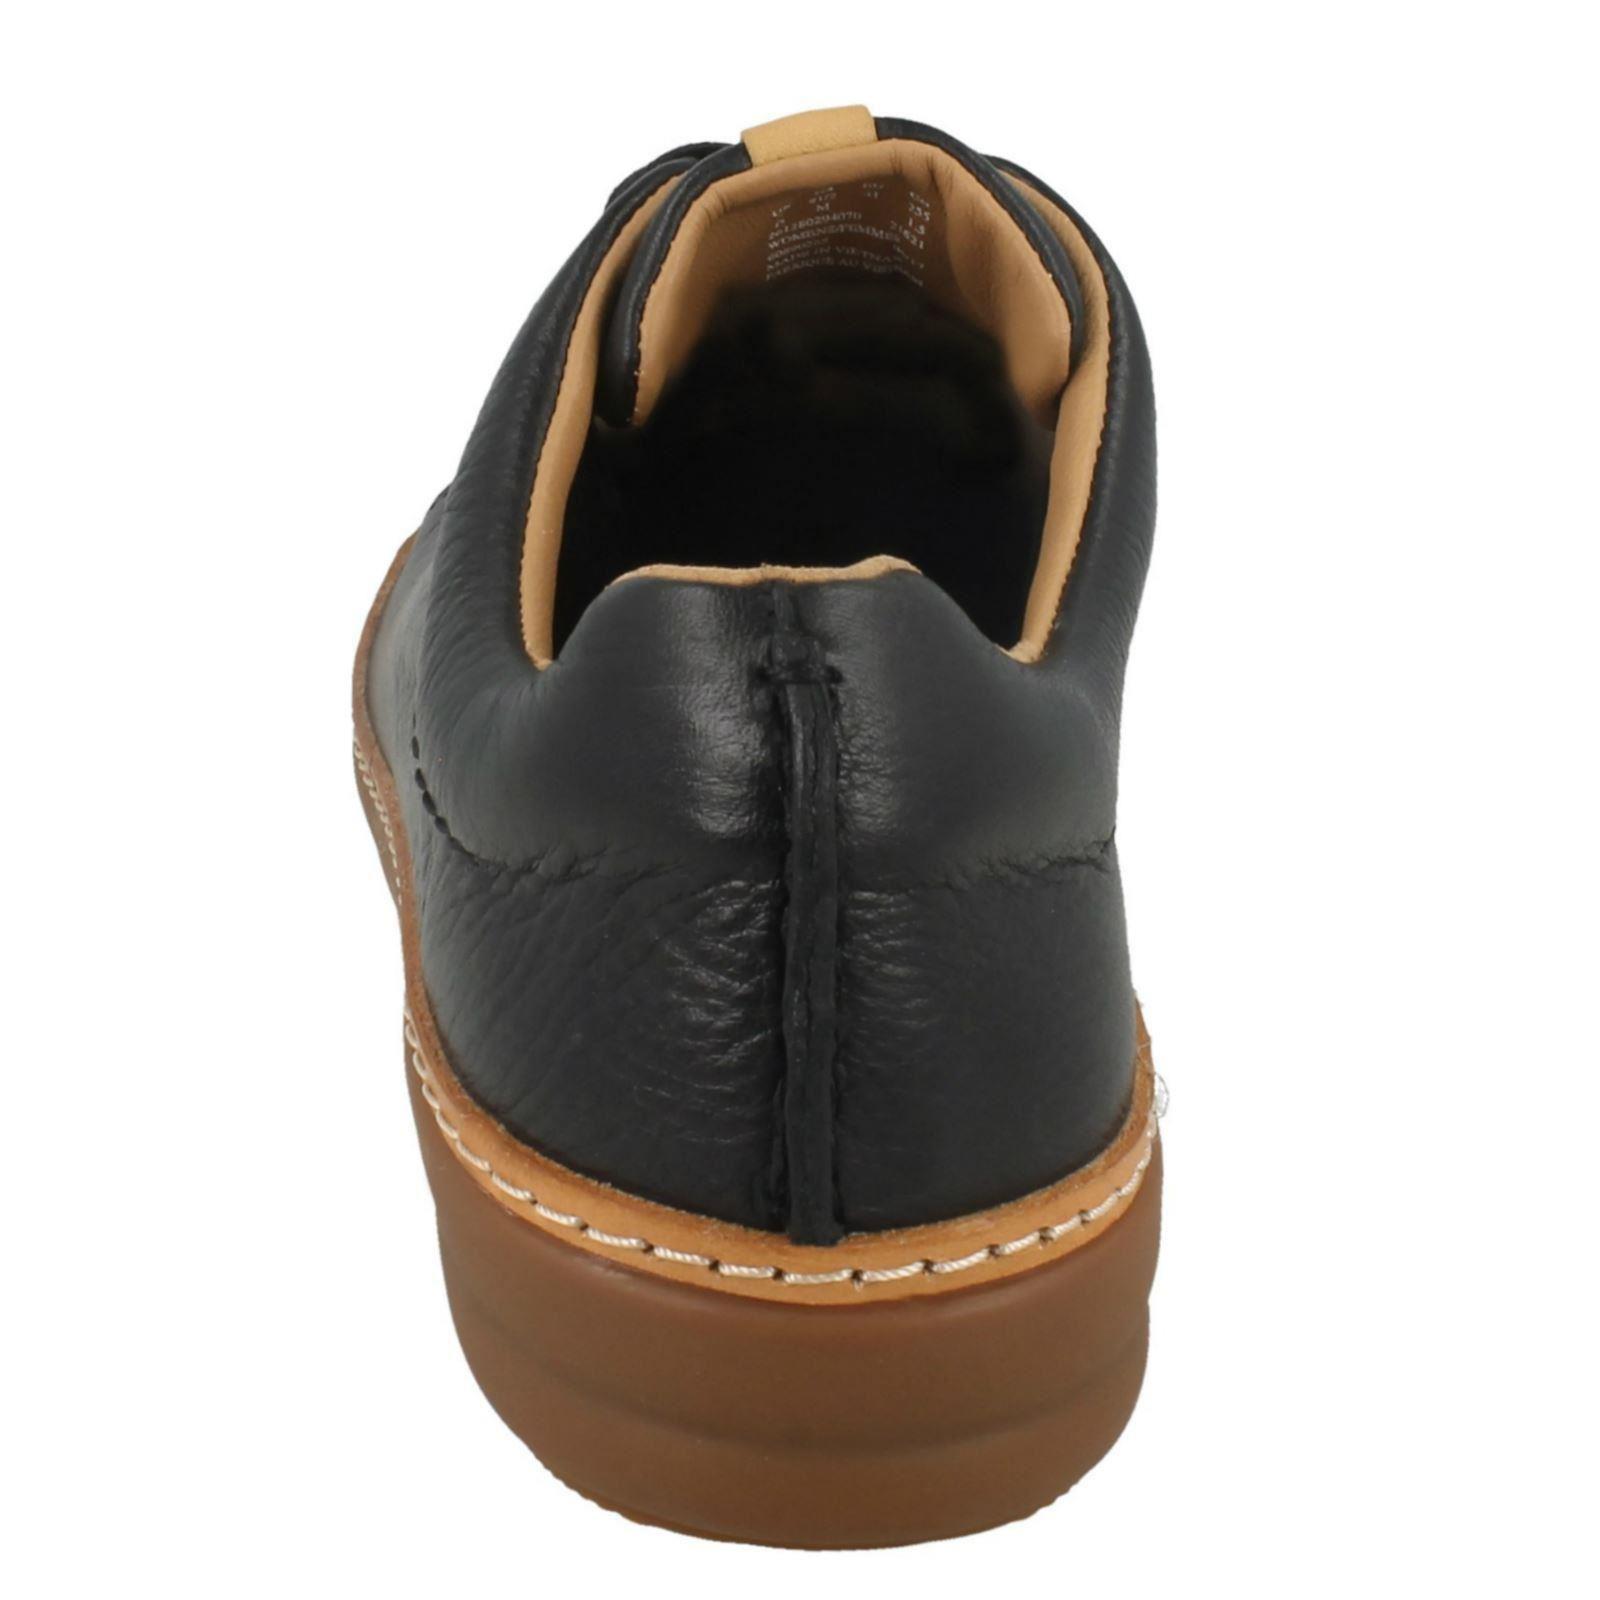 Sandali Donna Basse Clarks Con Lacci Scarpe Casual Basse Donna Stile-amberlee Crest 03a2a9